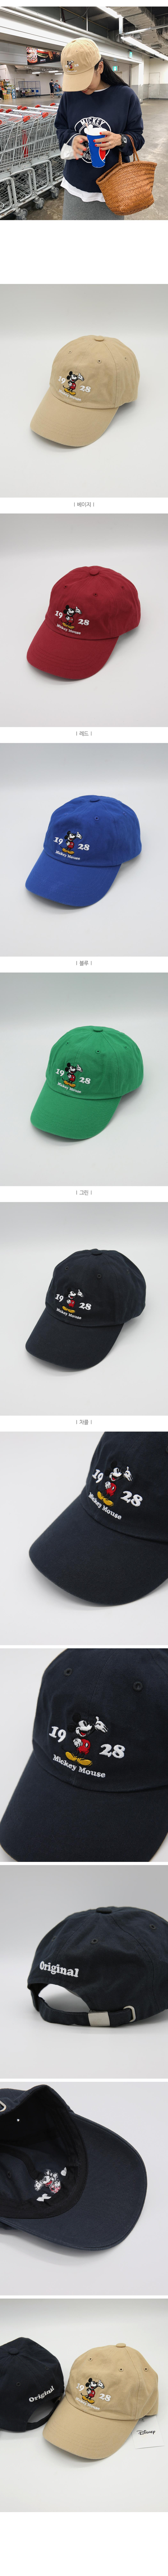 Genuine Disney/ Mickey embroidery ball cap